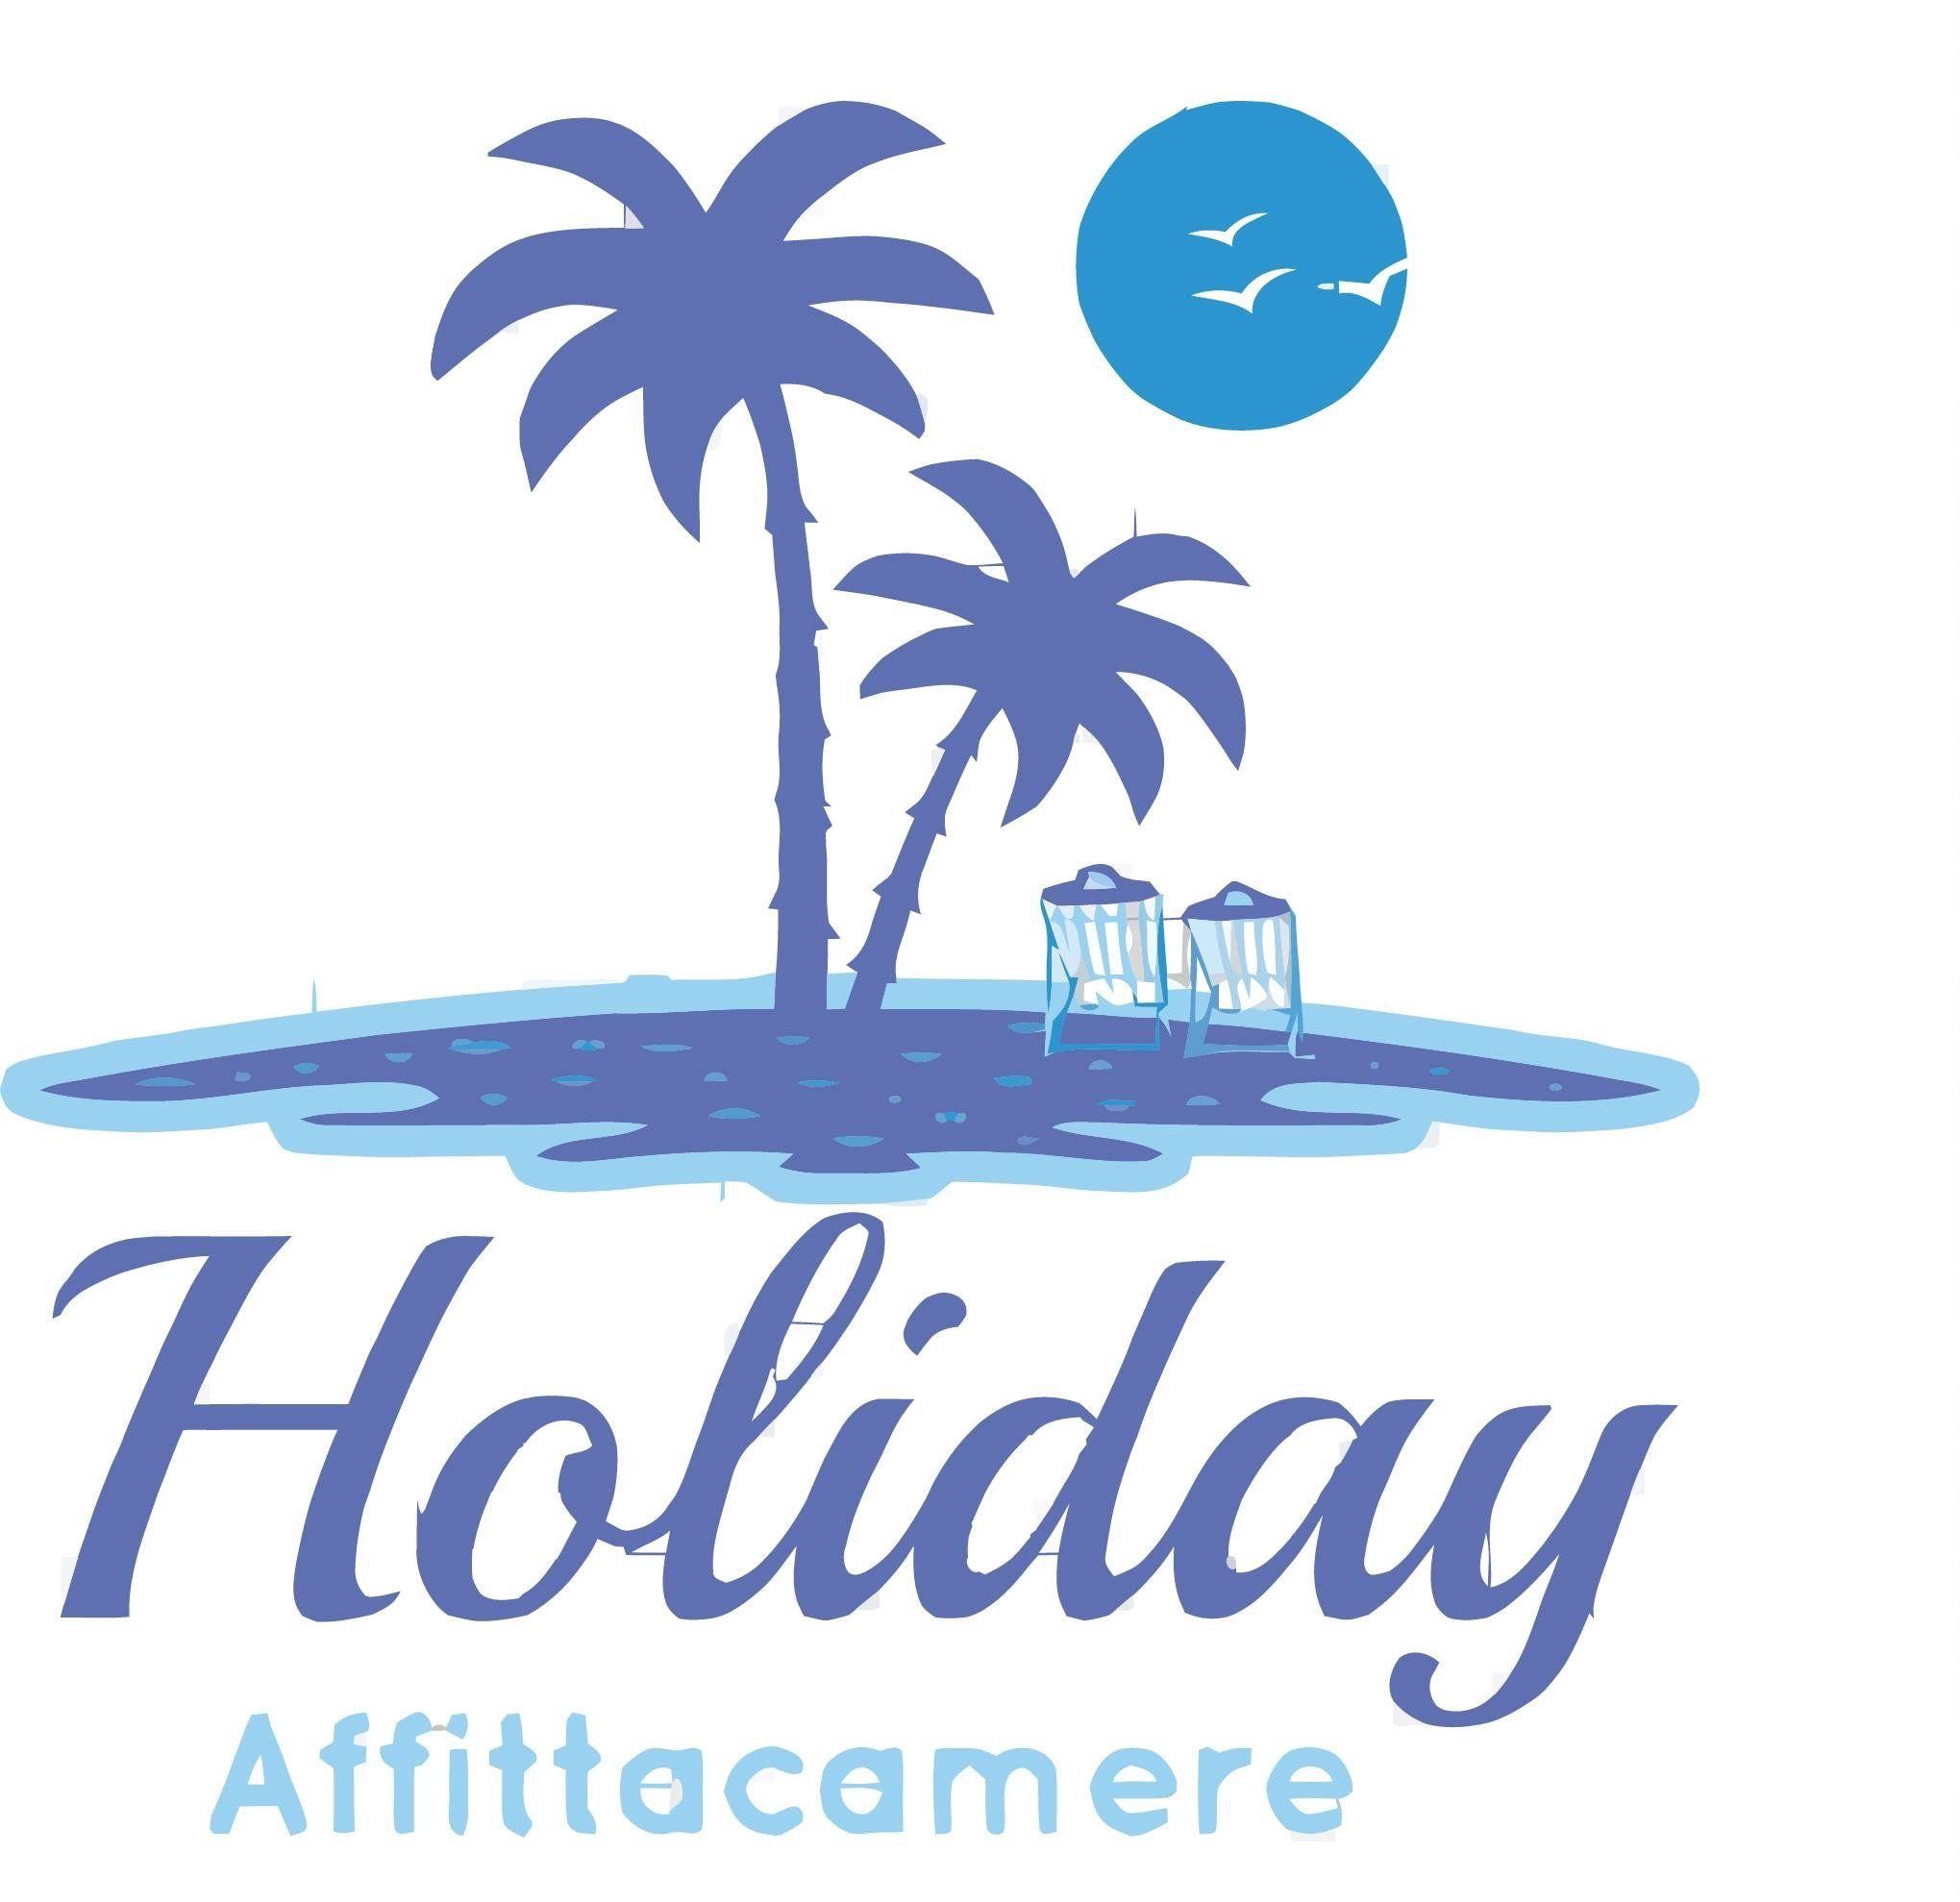 Holiday Affittacamere